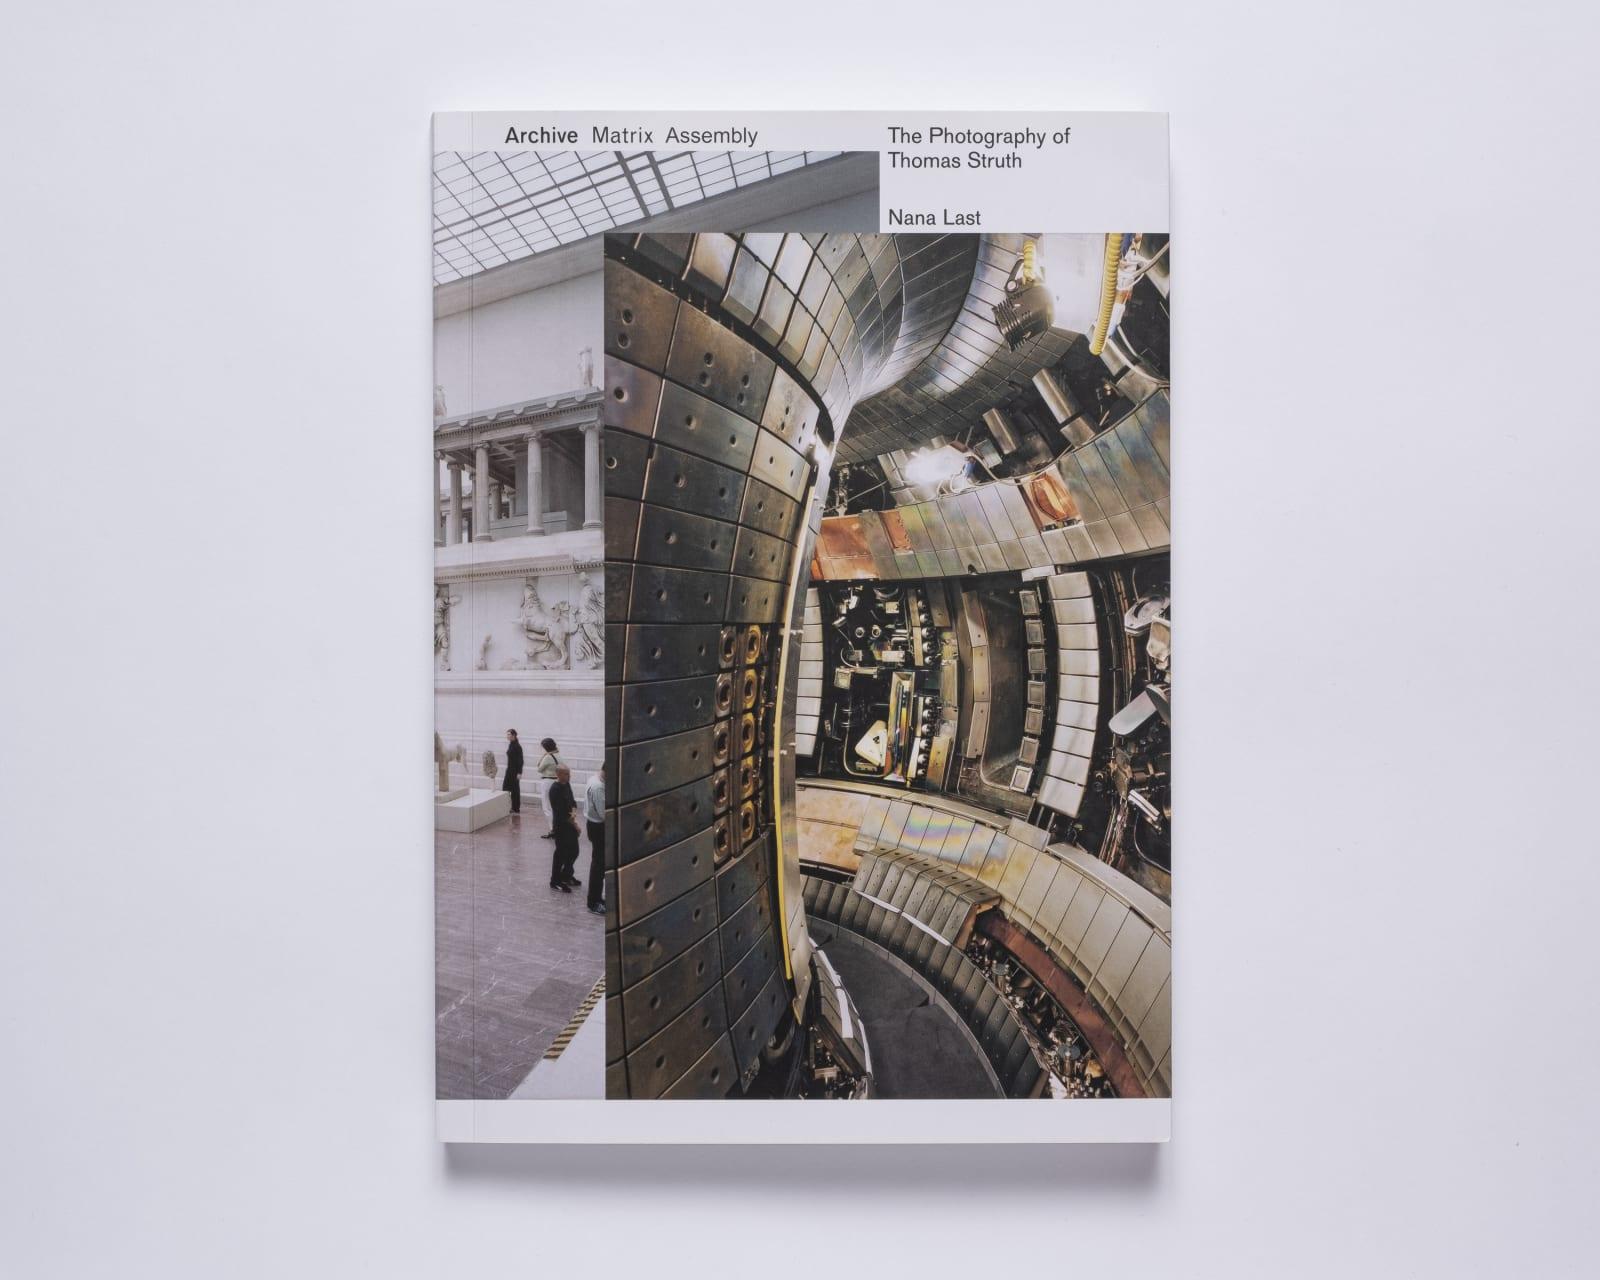 Thomas Struth Archive, Matrix, Assembly: The Photography of Thomas Struth